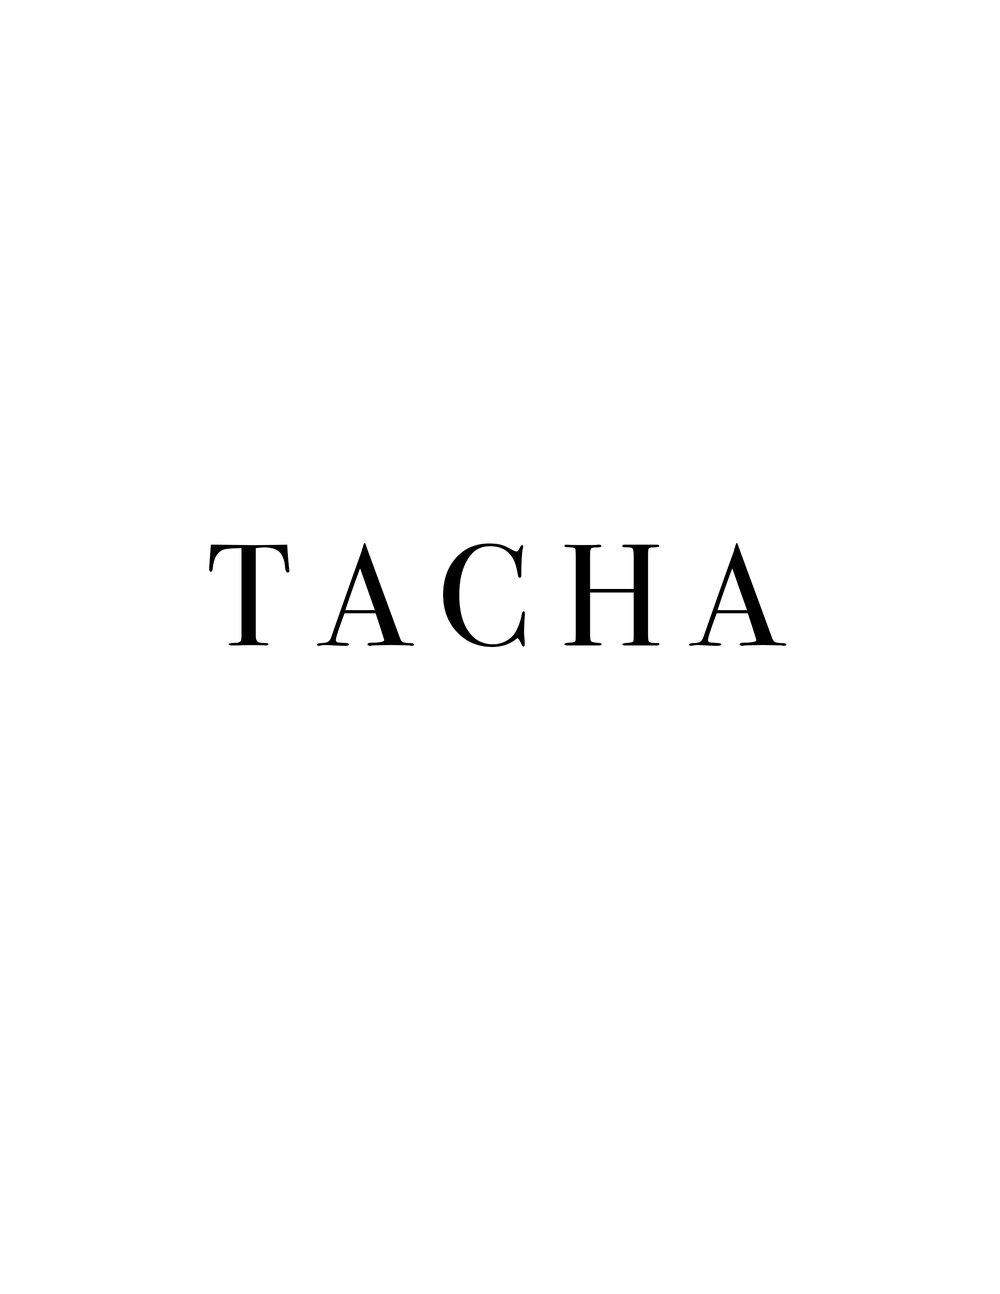 tacha.jpg